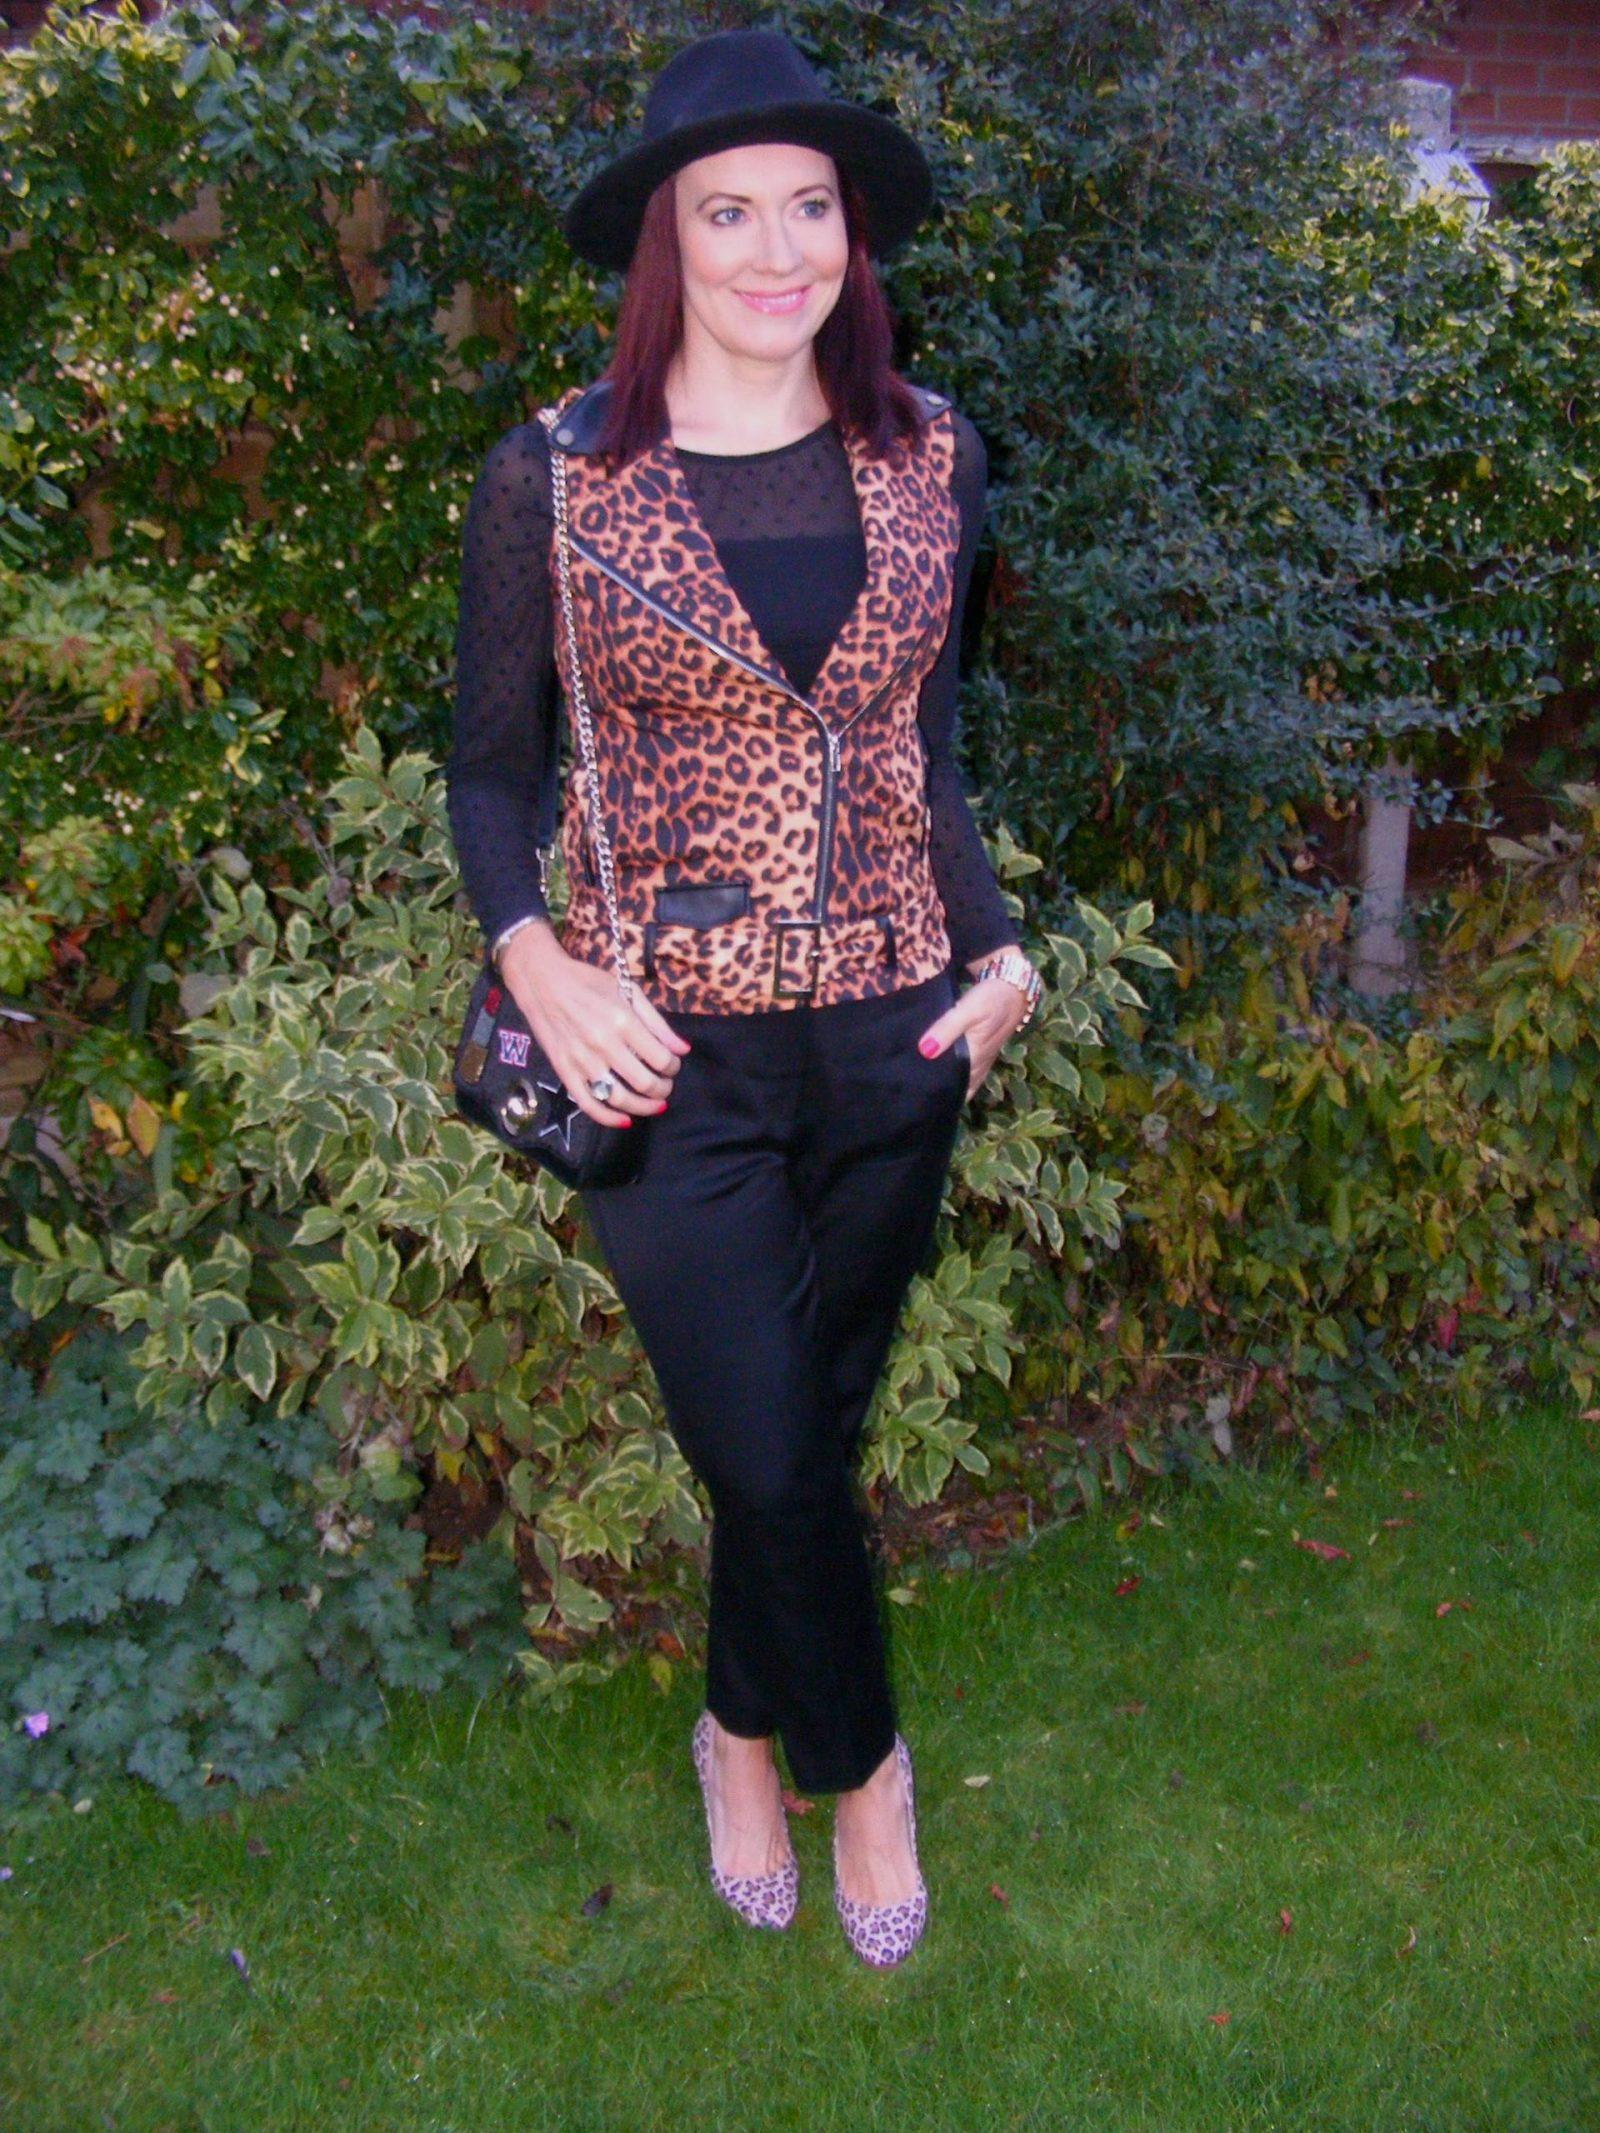 Leopard print waistcoaat Zara hat